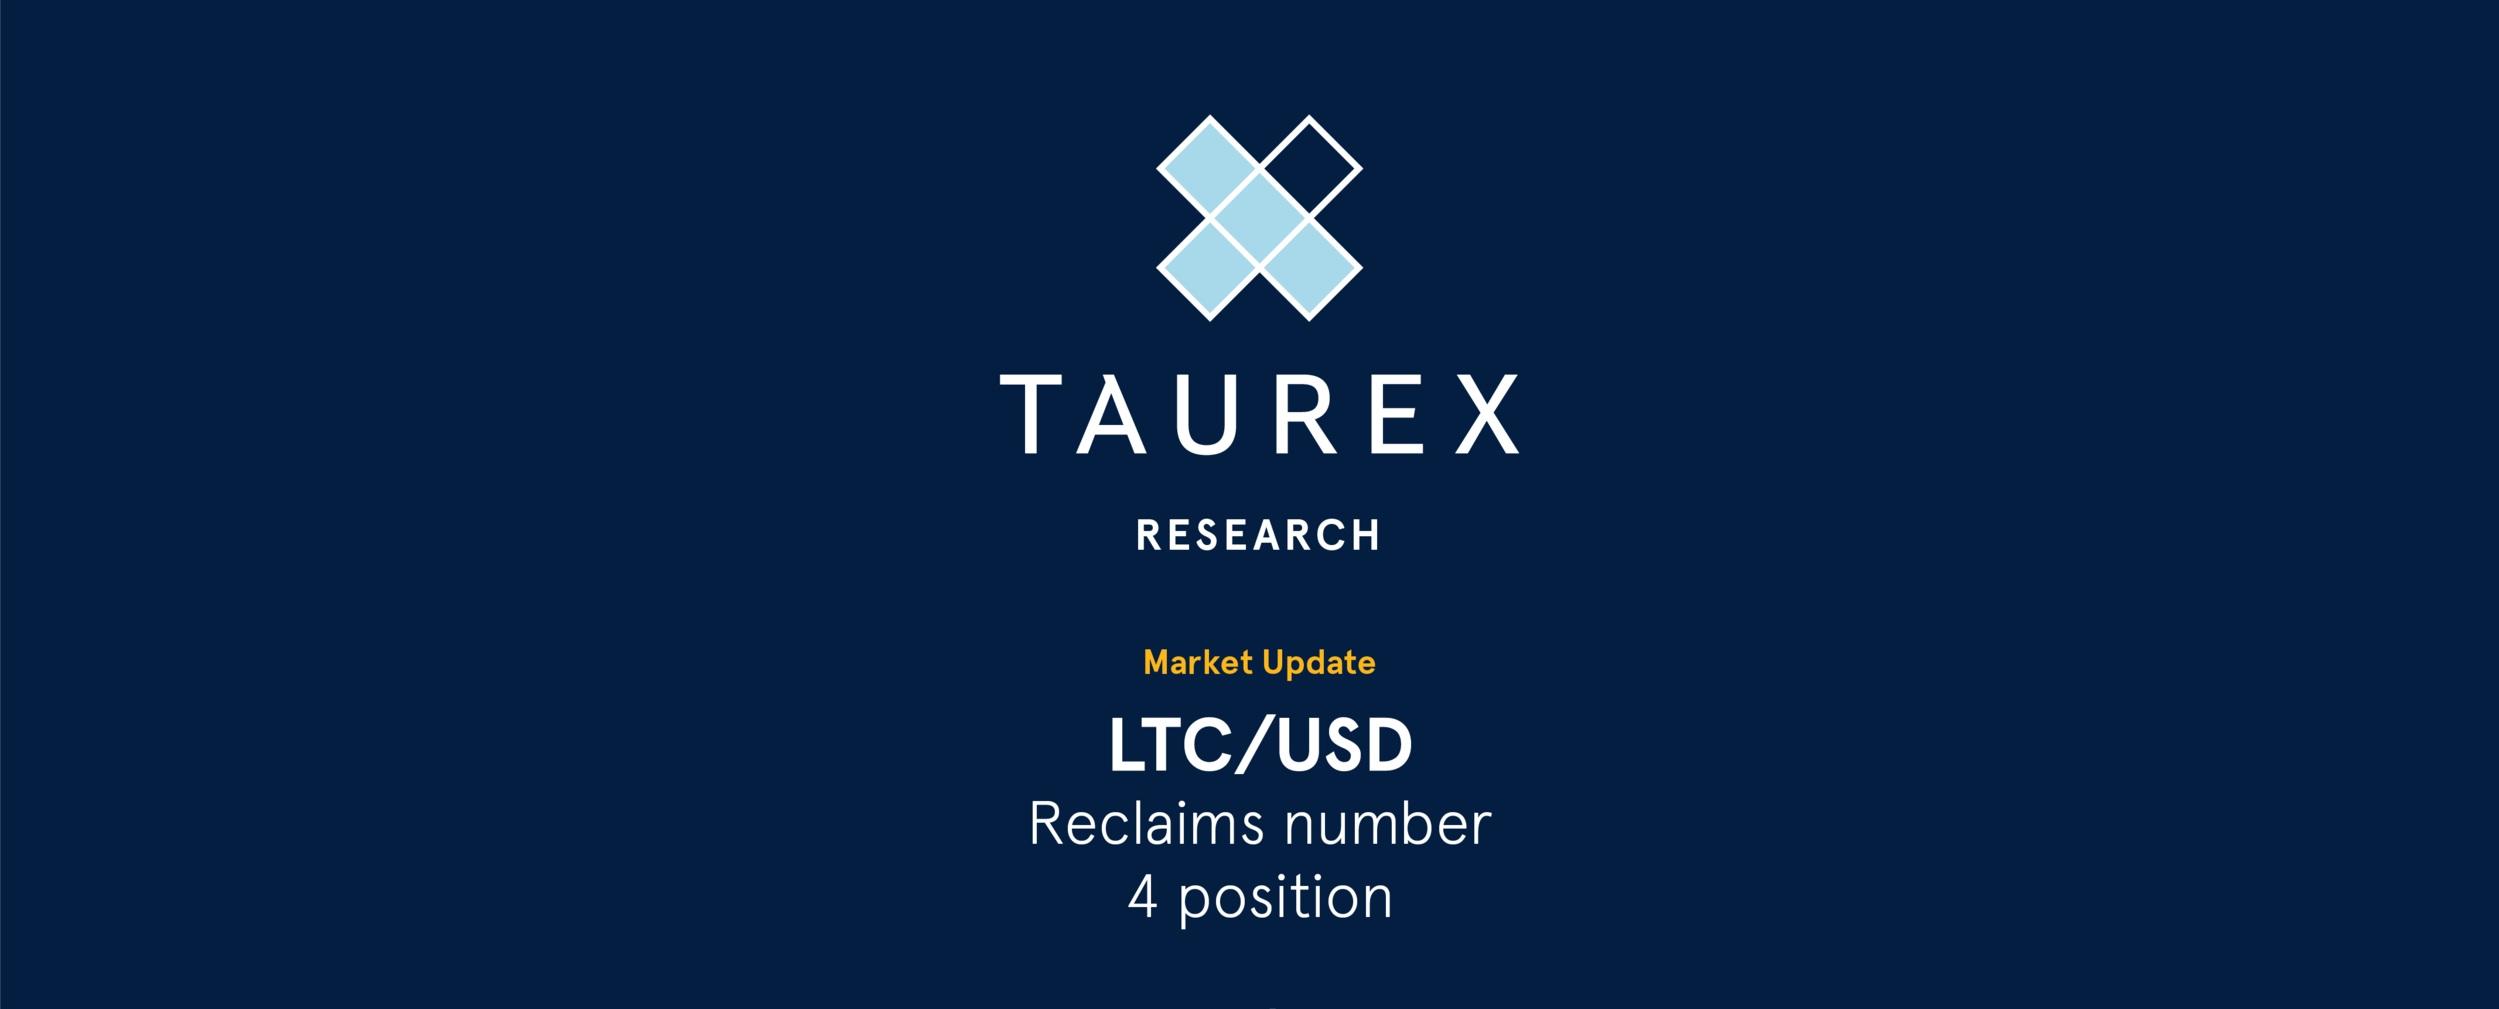 20190215_Market_Update_Twitter.jpg